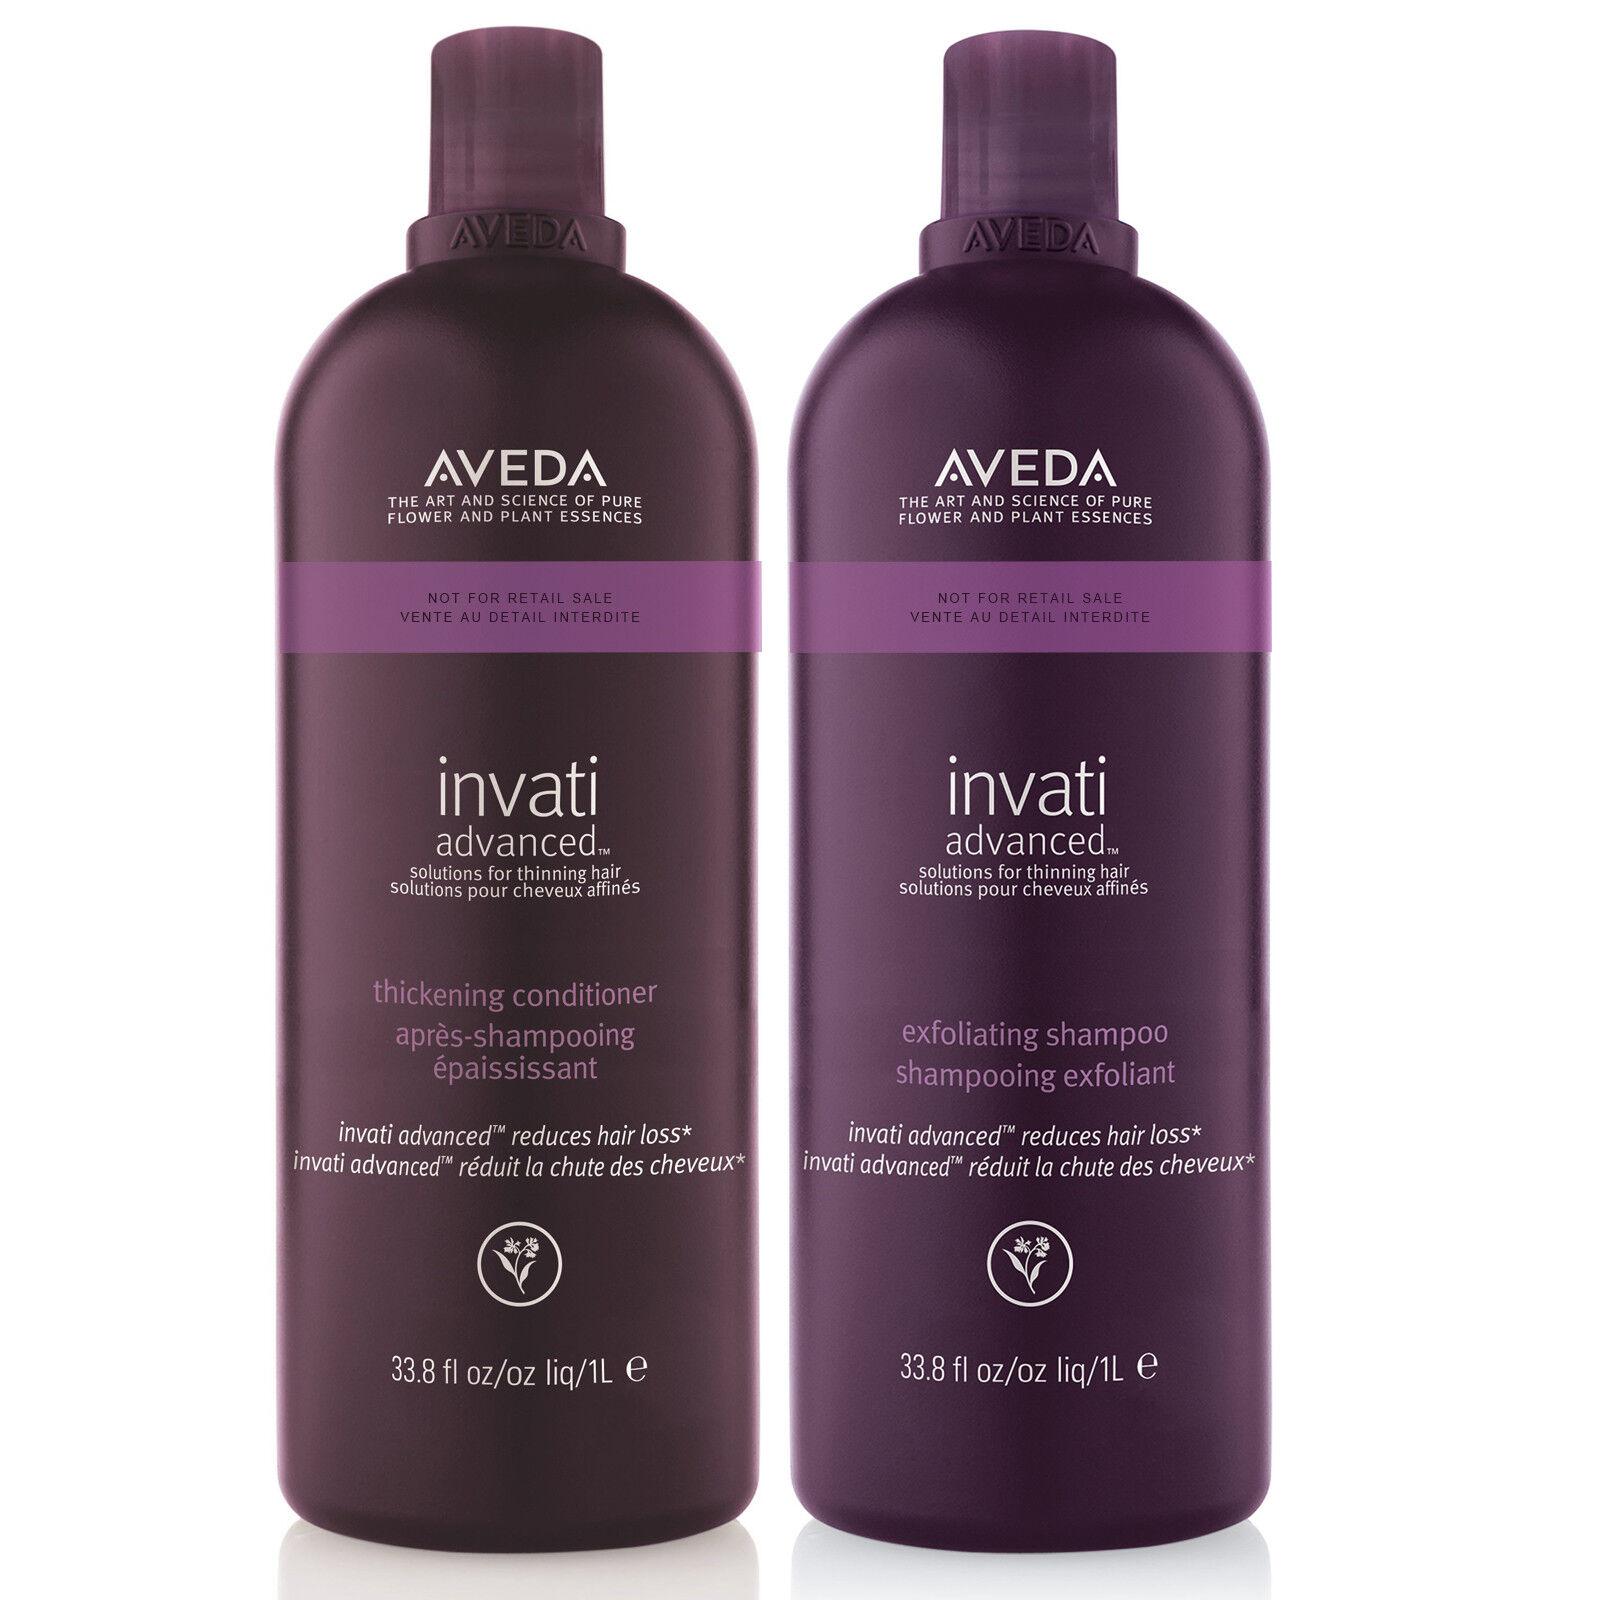 Invati Advanced Exfoliating Shampoo and Thickening Condition